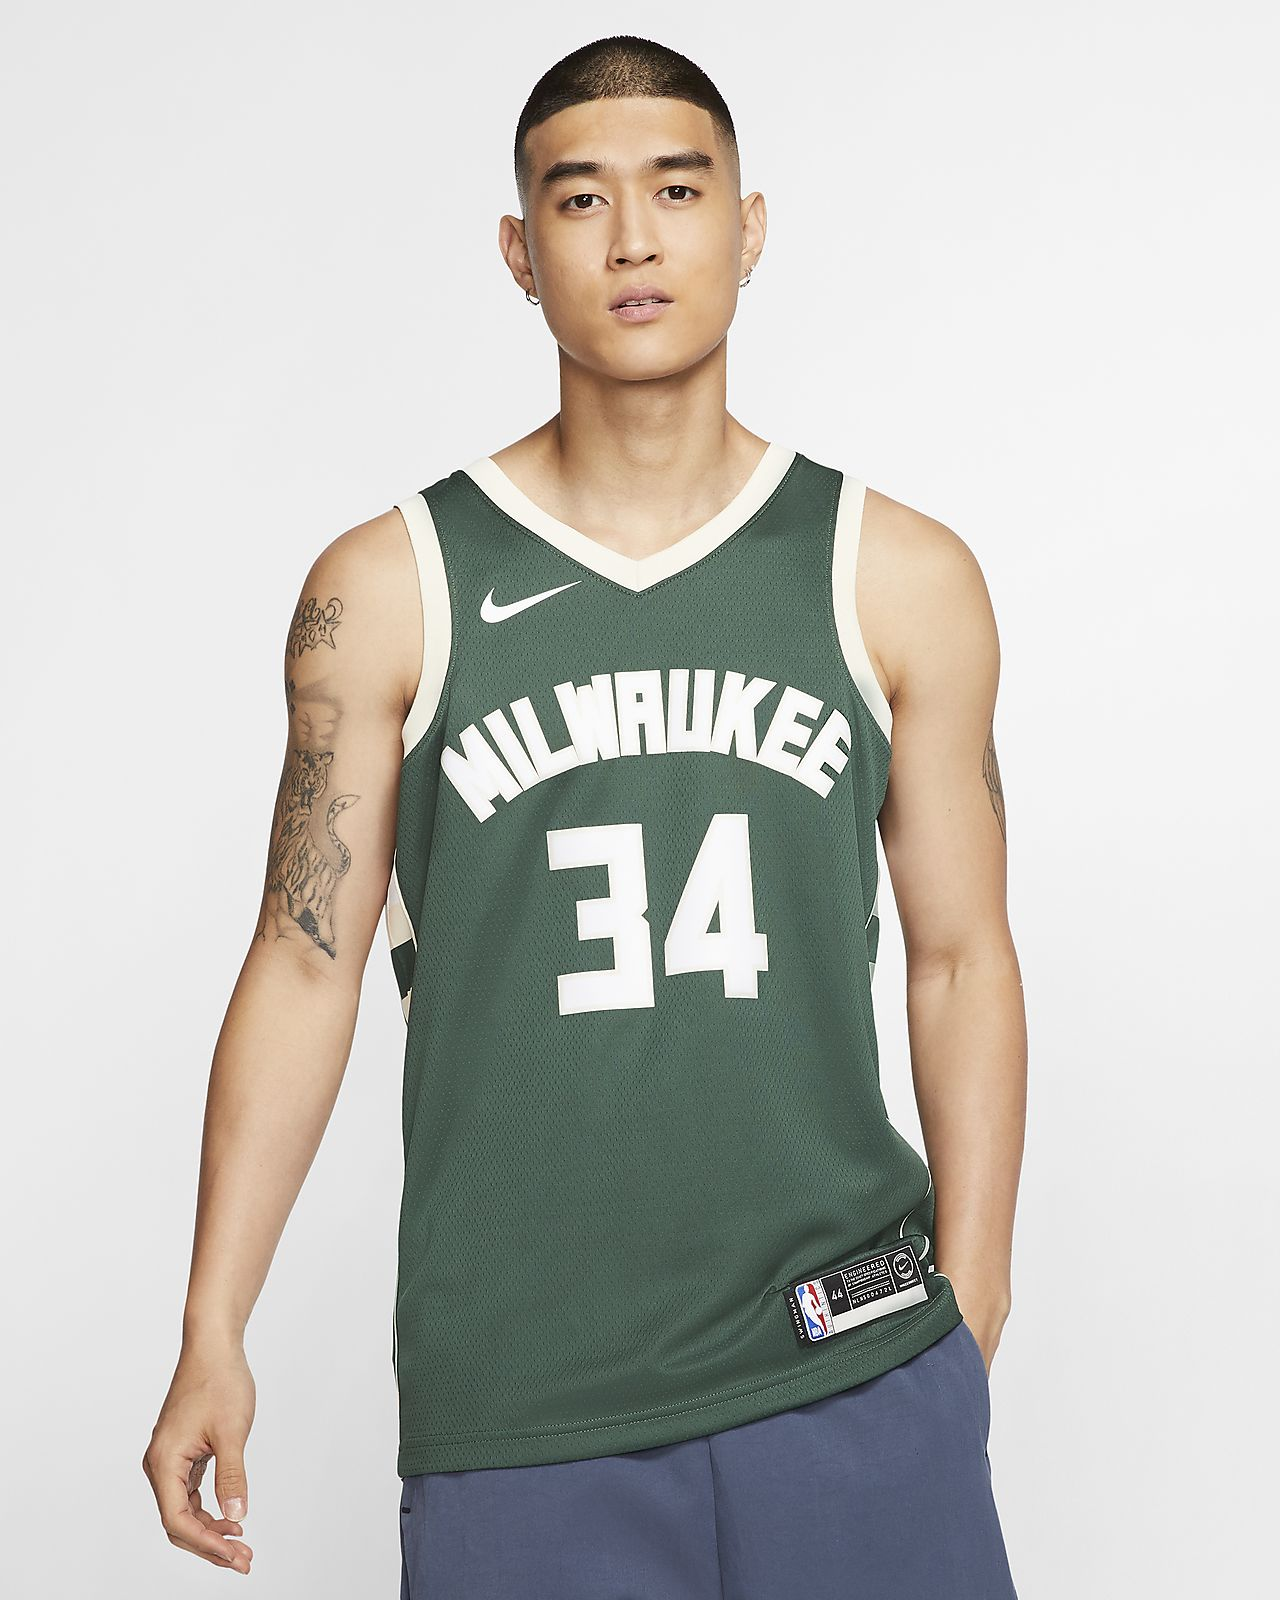 Koszulka męska Nike NBA Connected Jersey Giannis Antetokounmpo Icon Edition Swingman (Milwaukee Bucks)